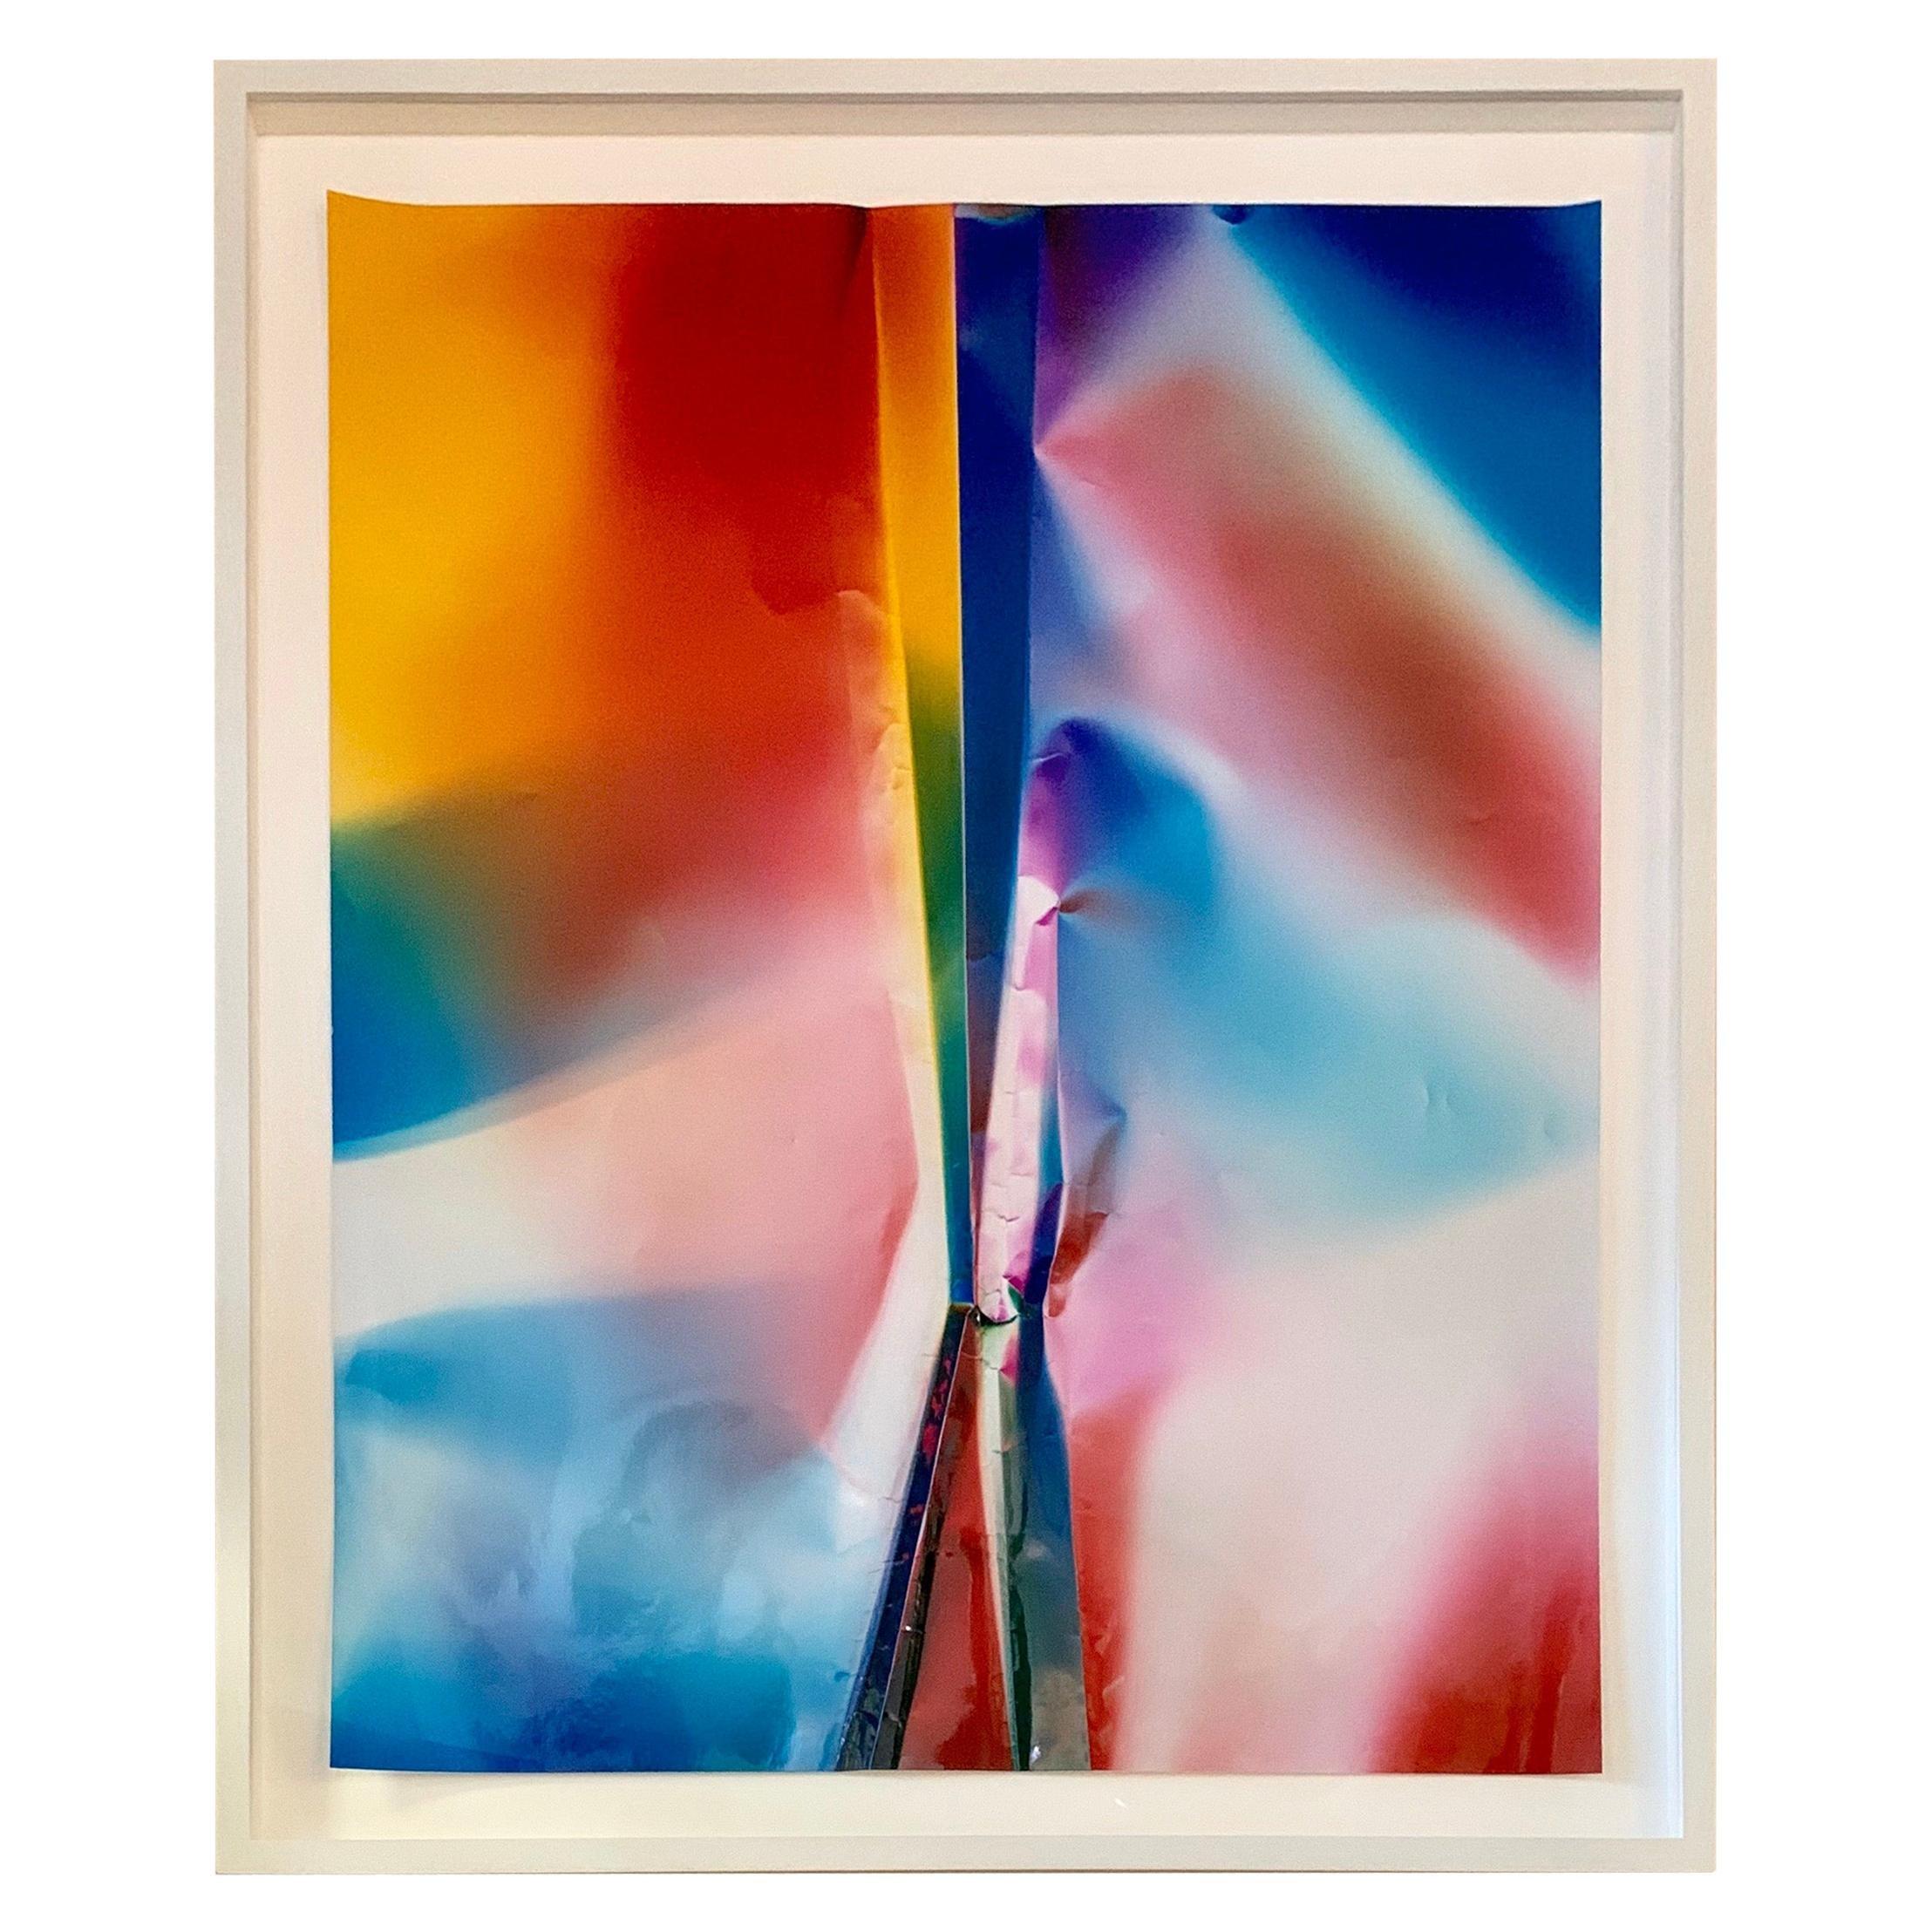 Caesura 2016 Photographic Art Chromogenic Print by Ellen Carey